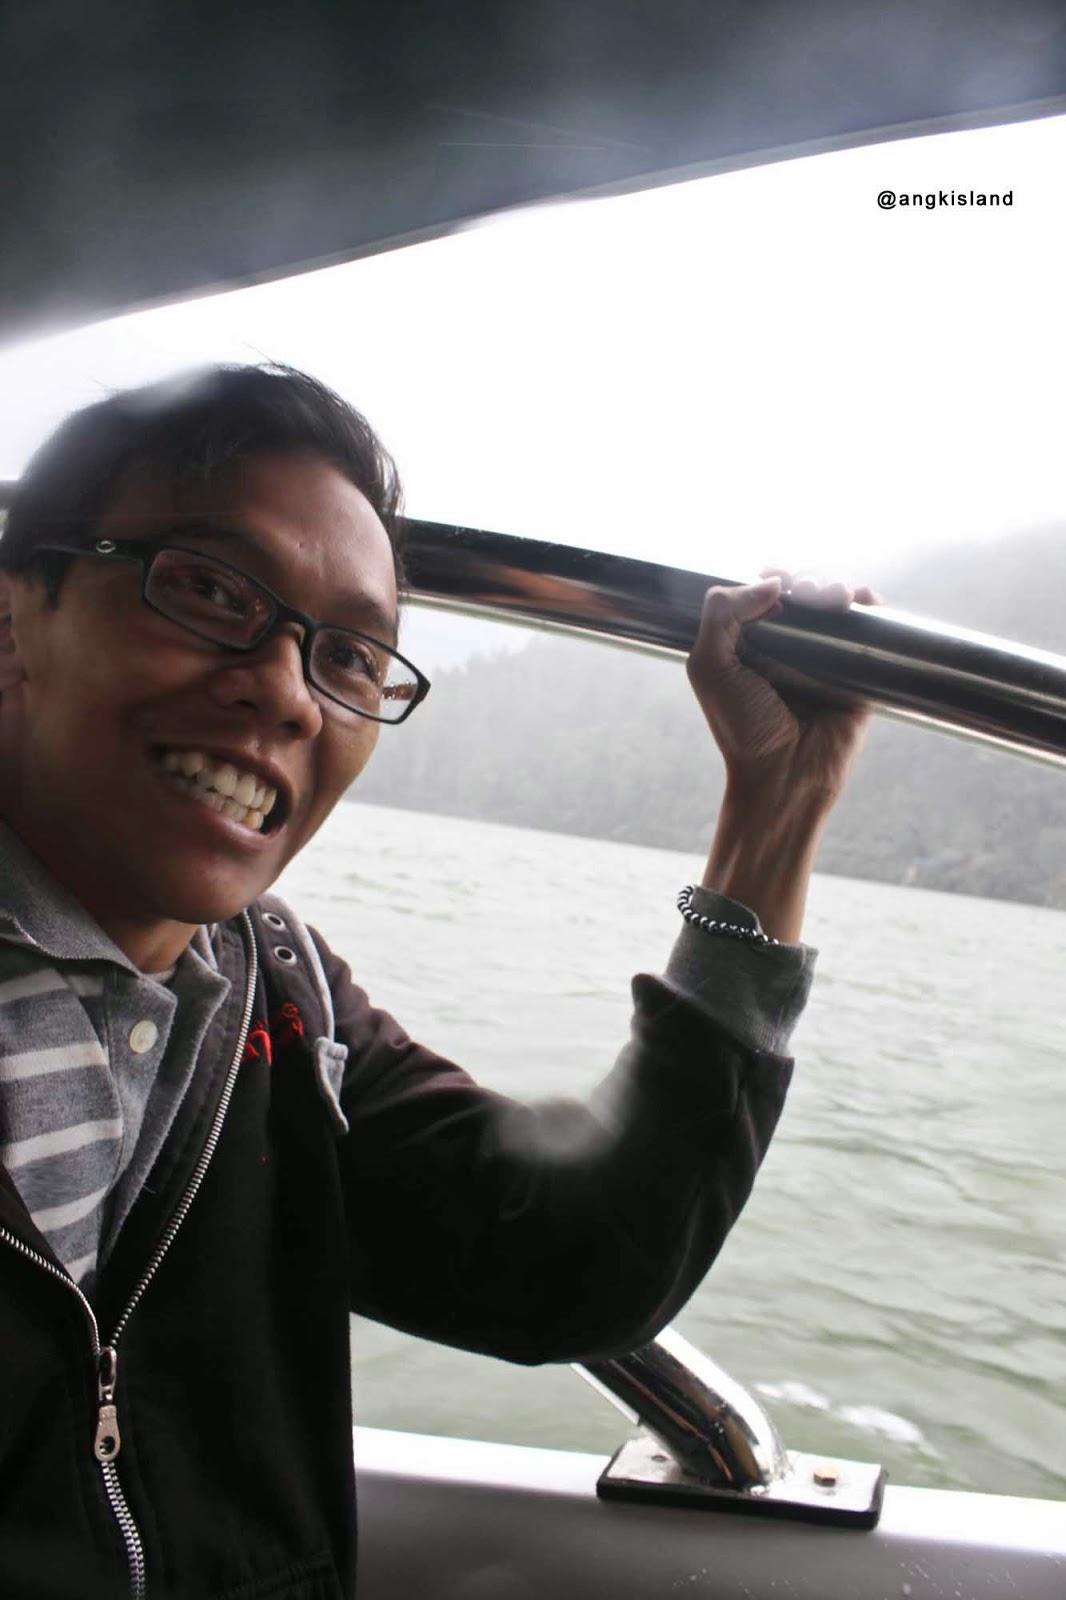 naik boat sarangan